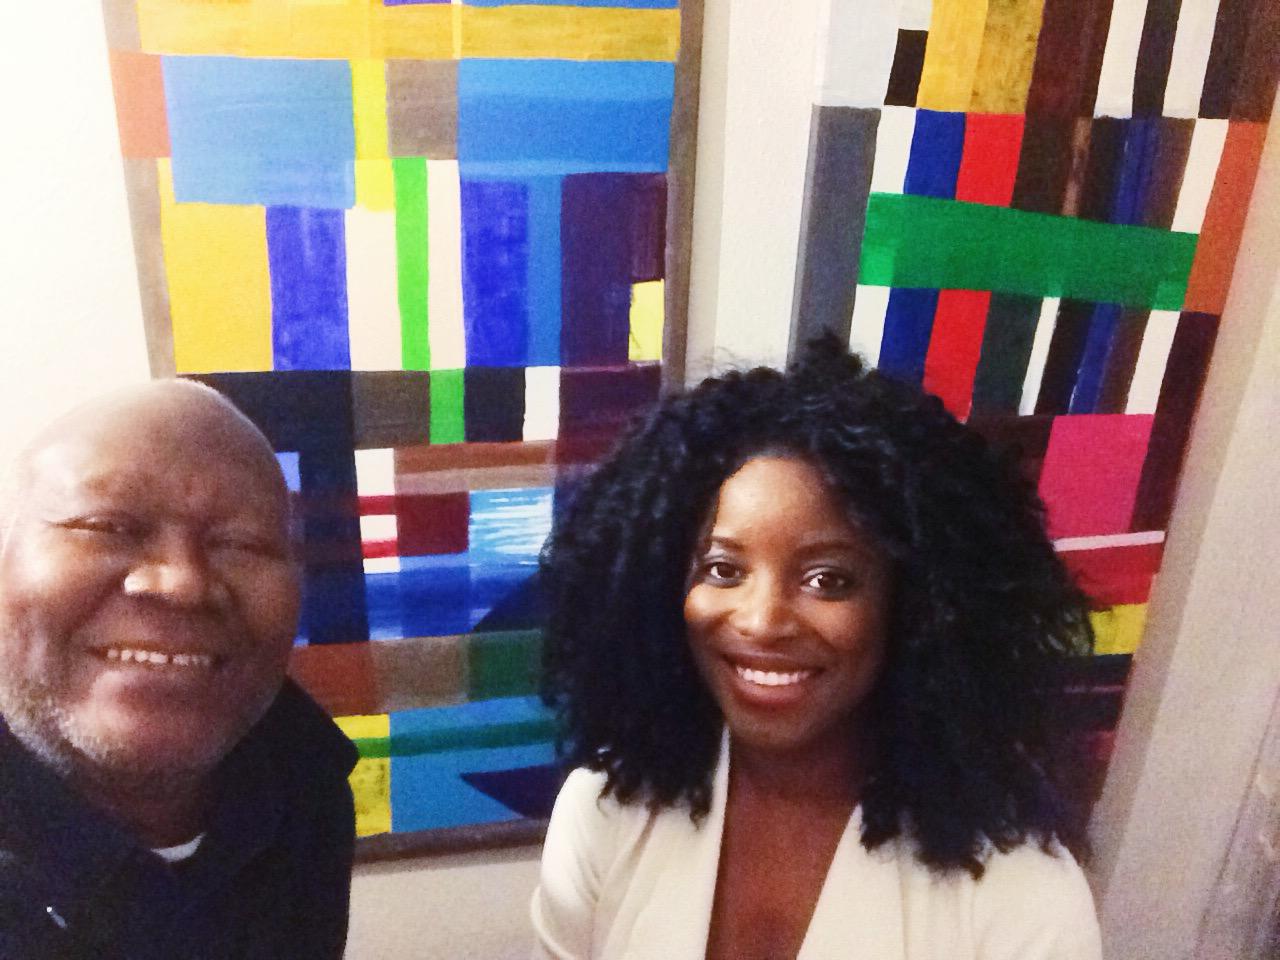 Atta Kwami (left), Sharon Obuobi (right)